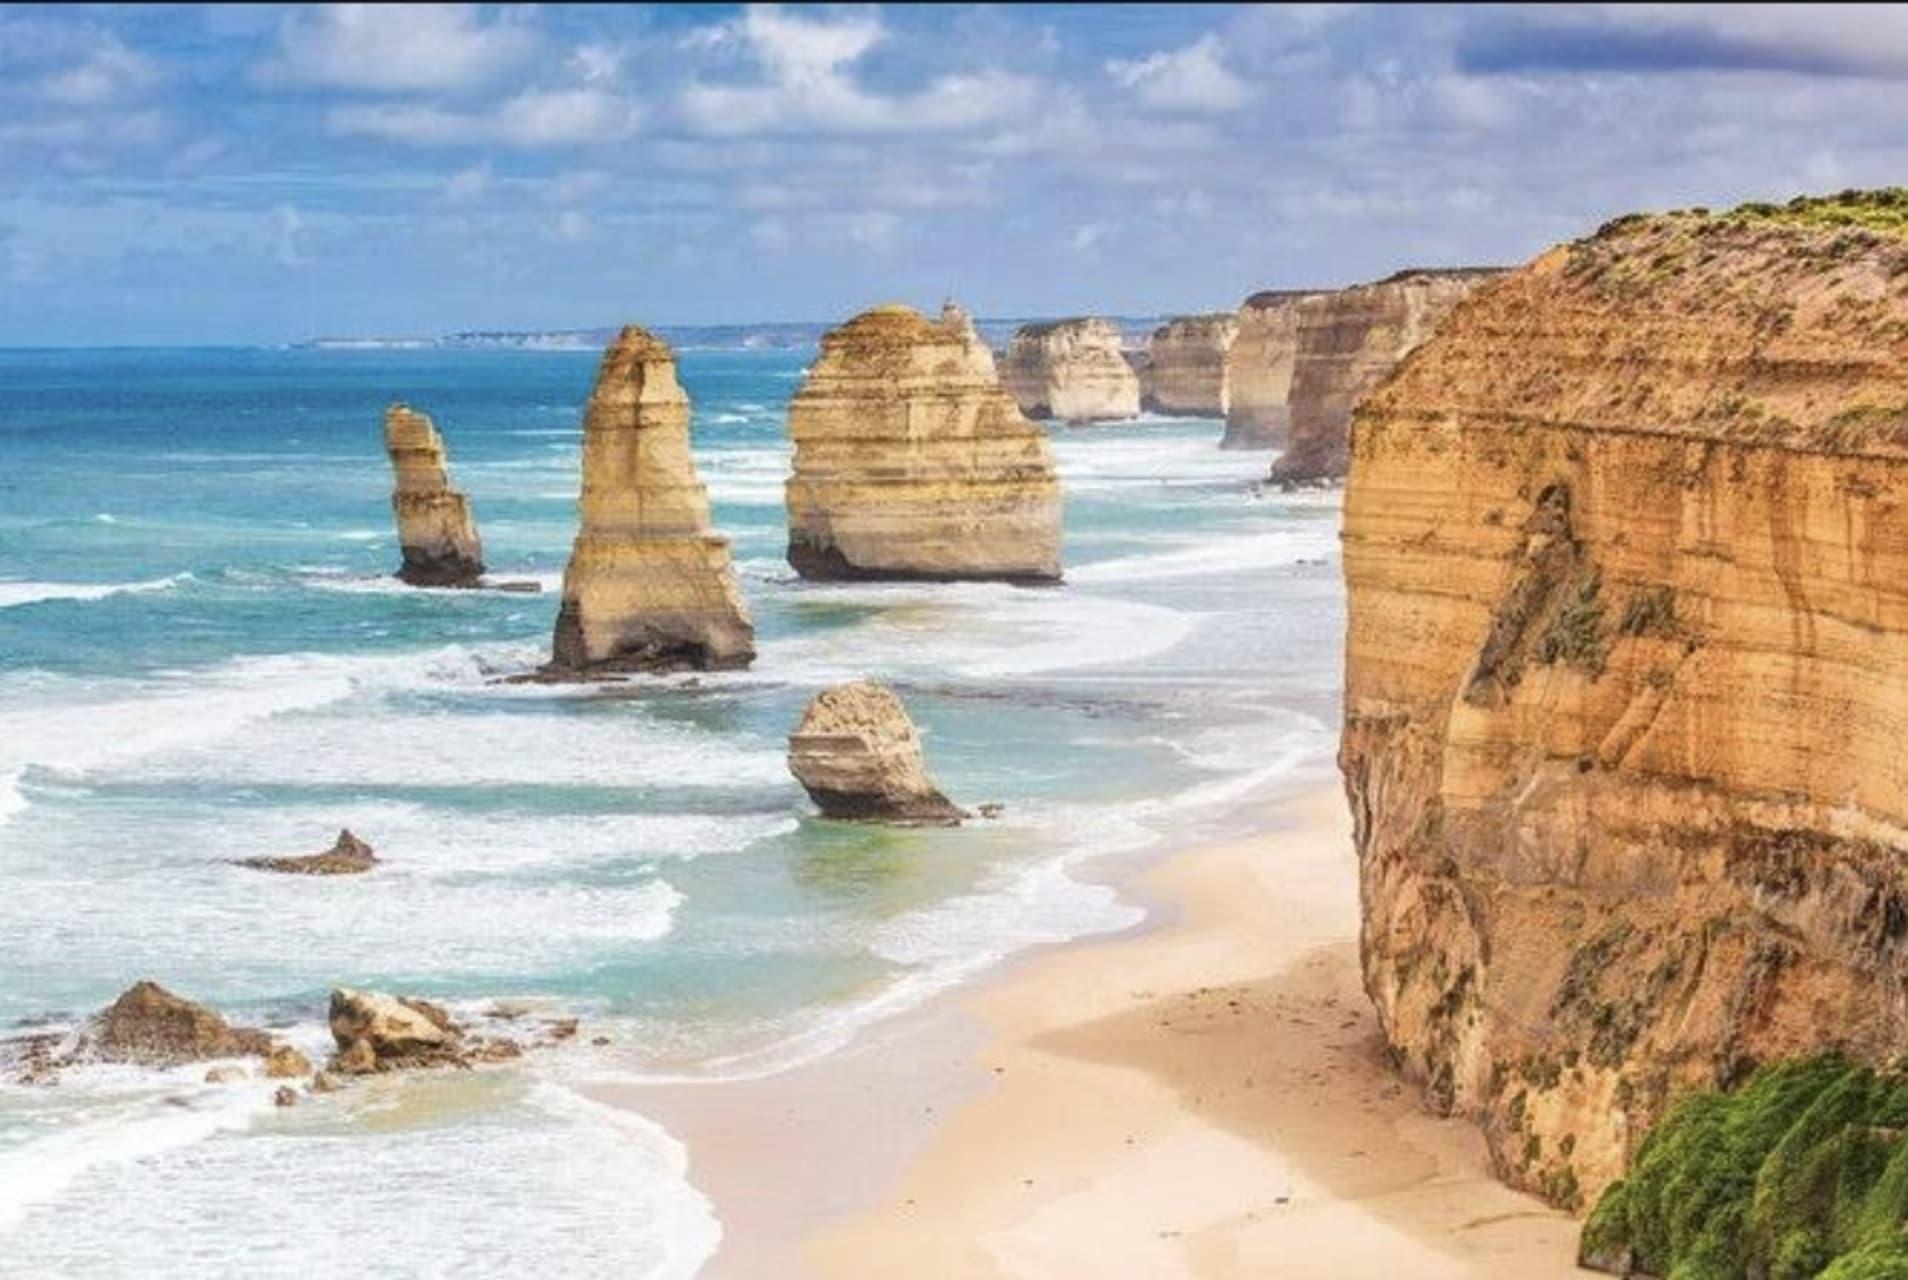 Victoria - Great Ocean Road: The 12 Apostles